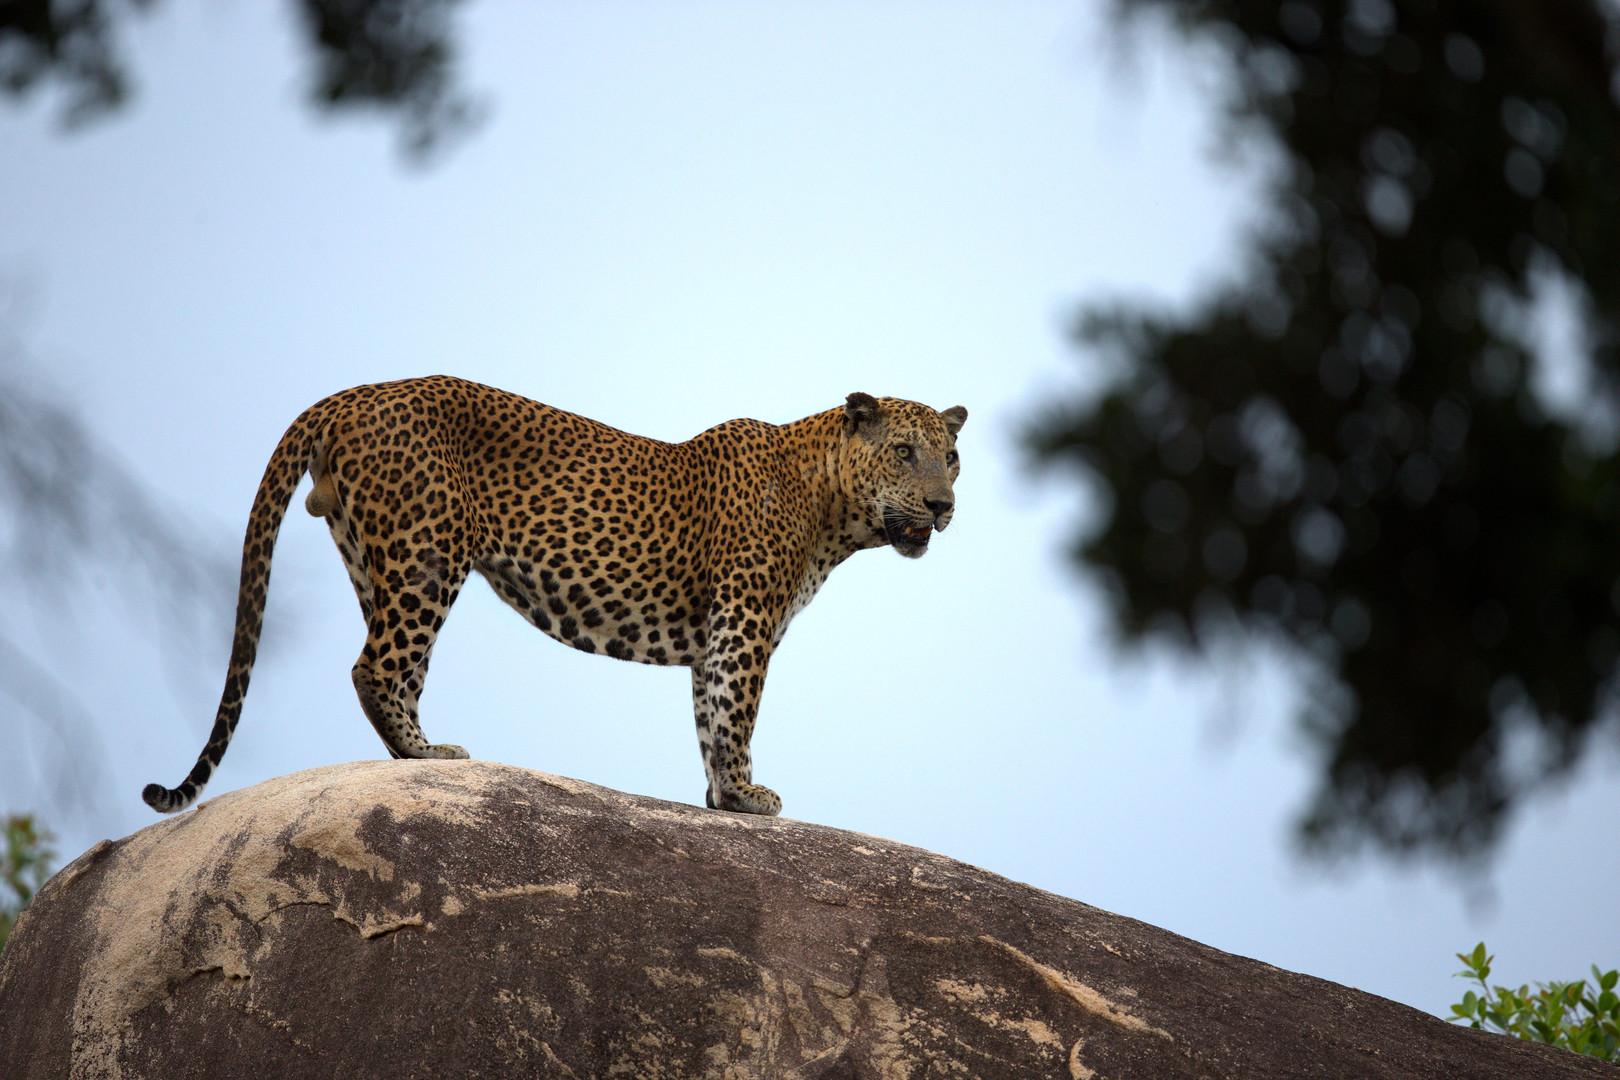 Leopard_2-_Chitral_Jayatilake.jpg